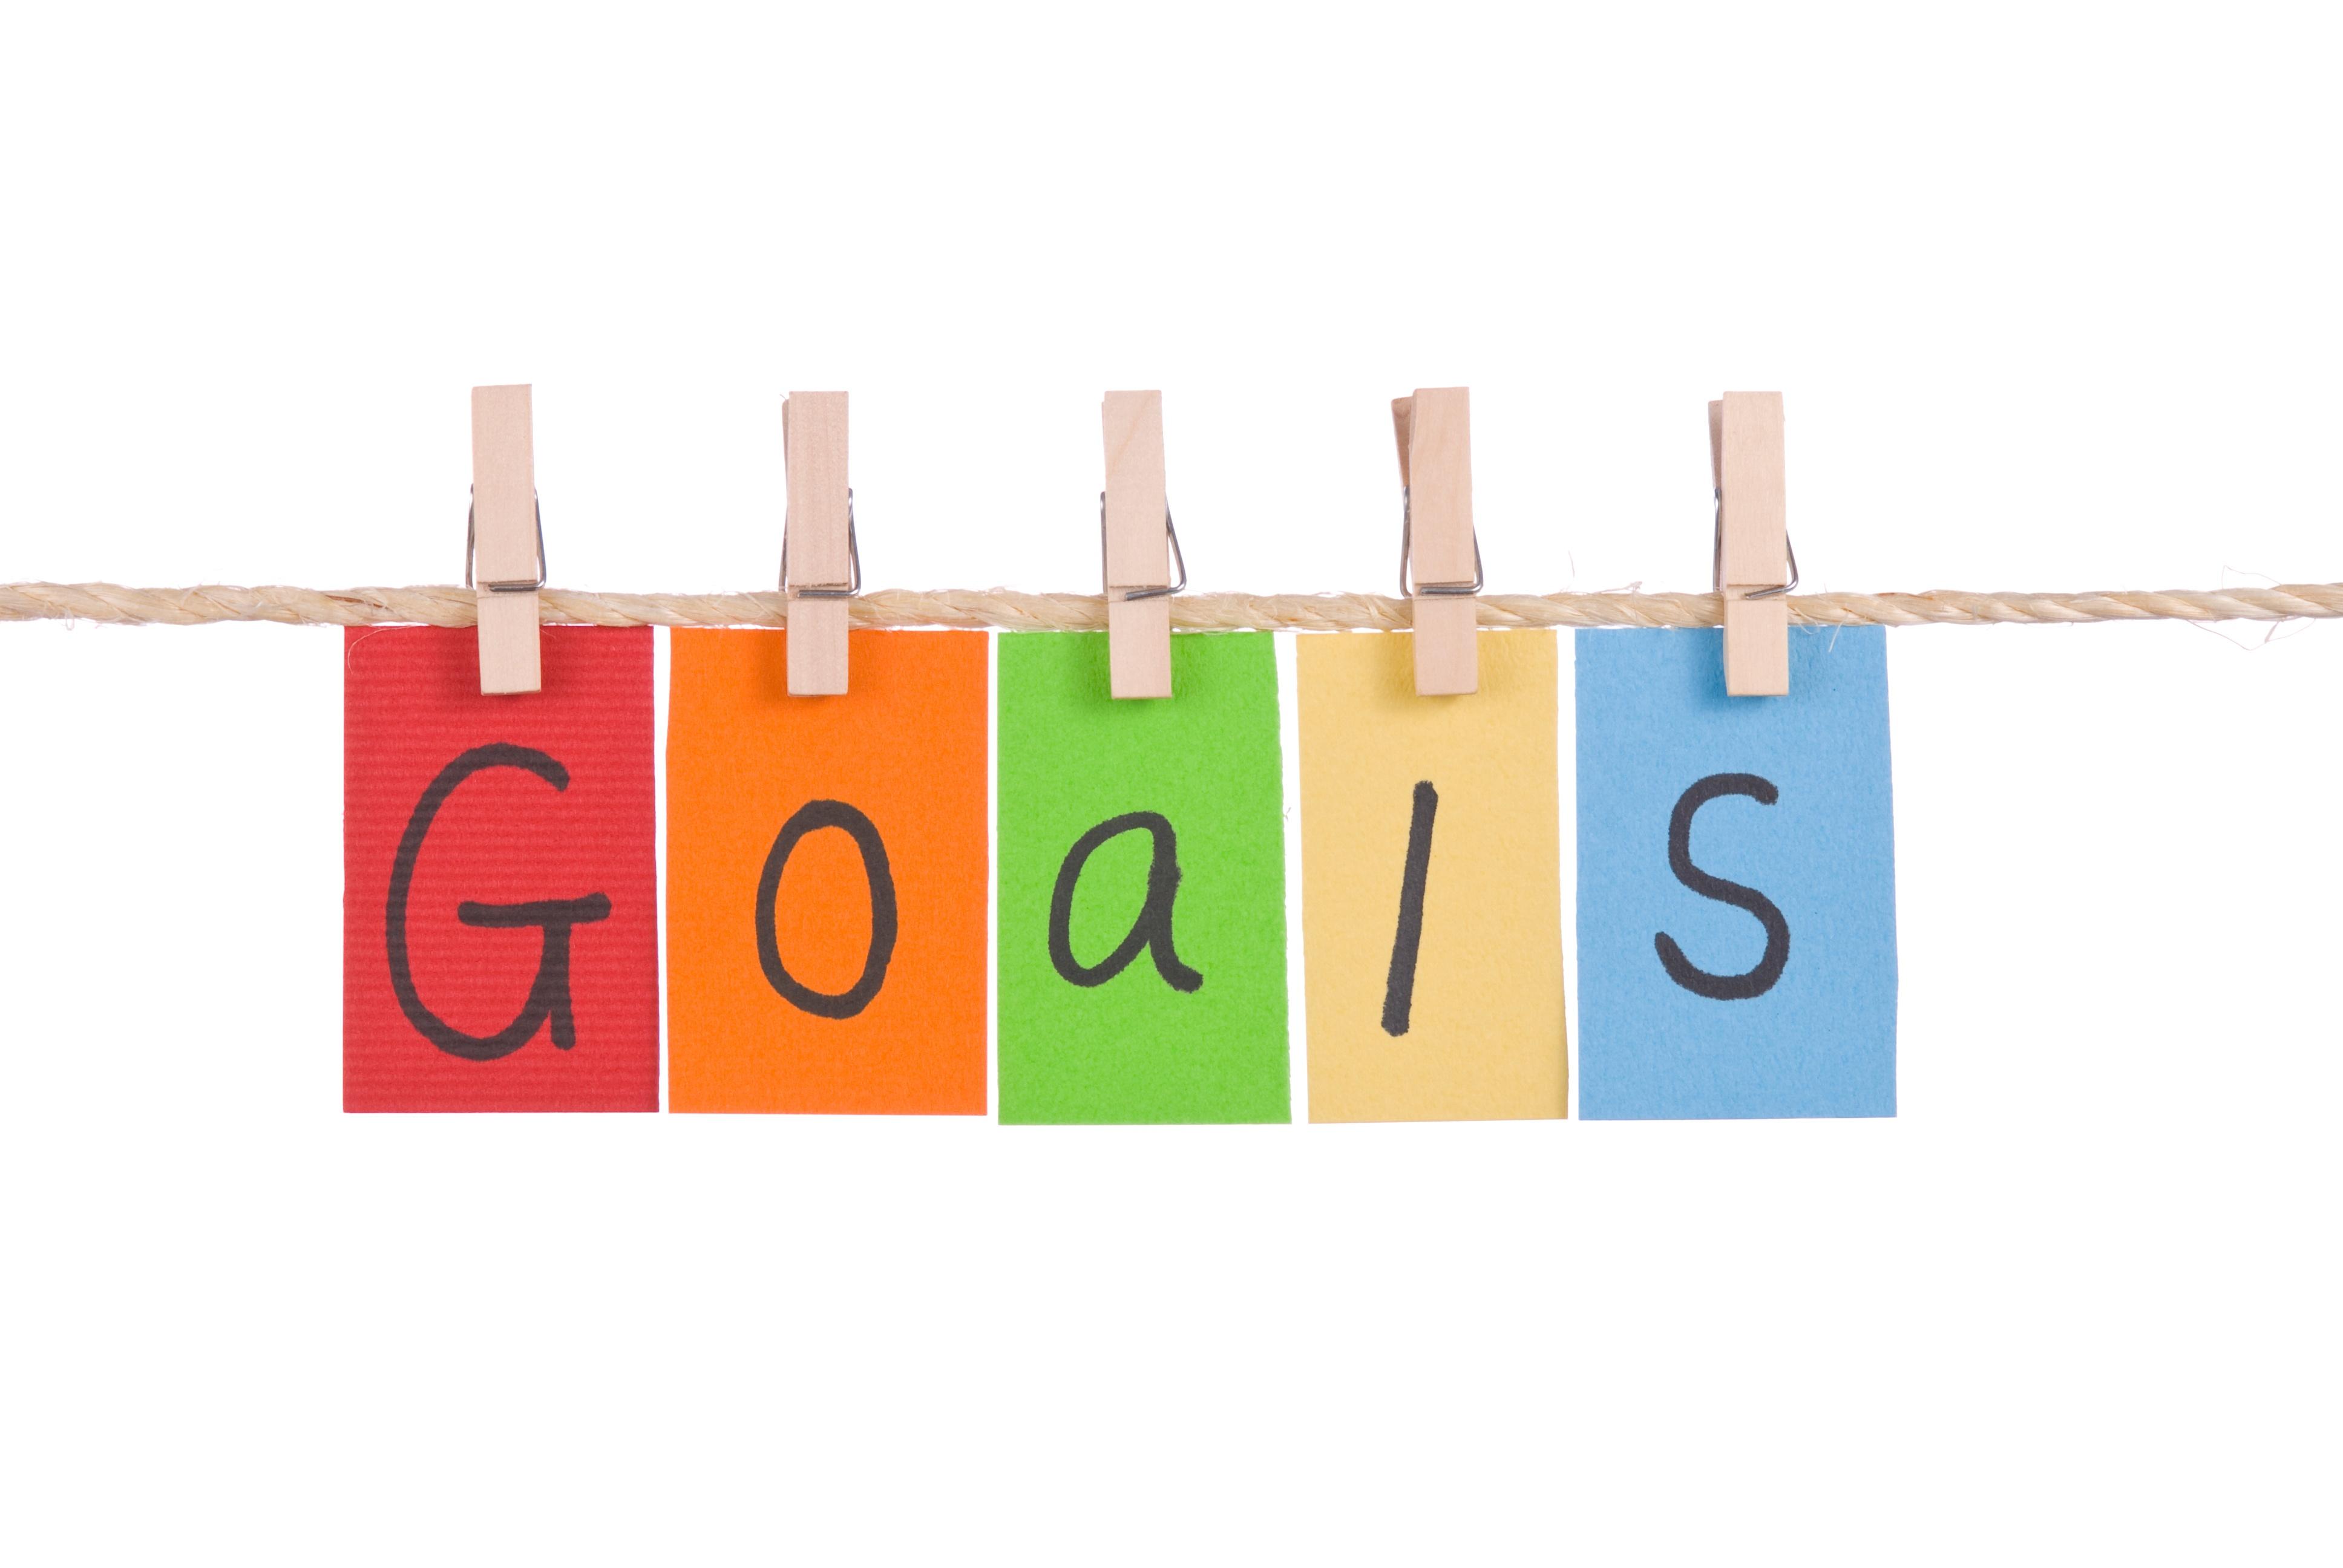 Free meeting goals cliparts. Motivation clipart school goal